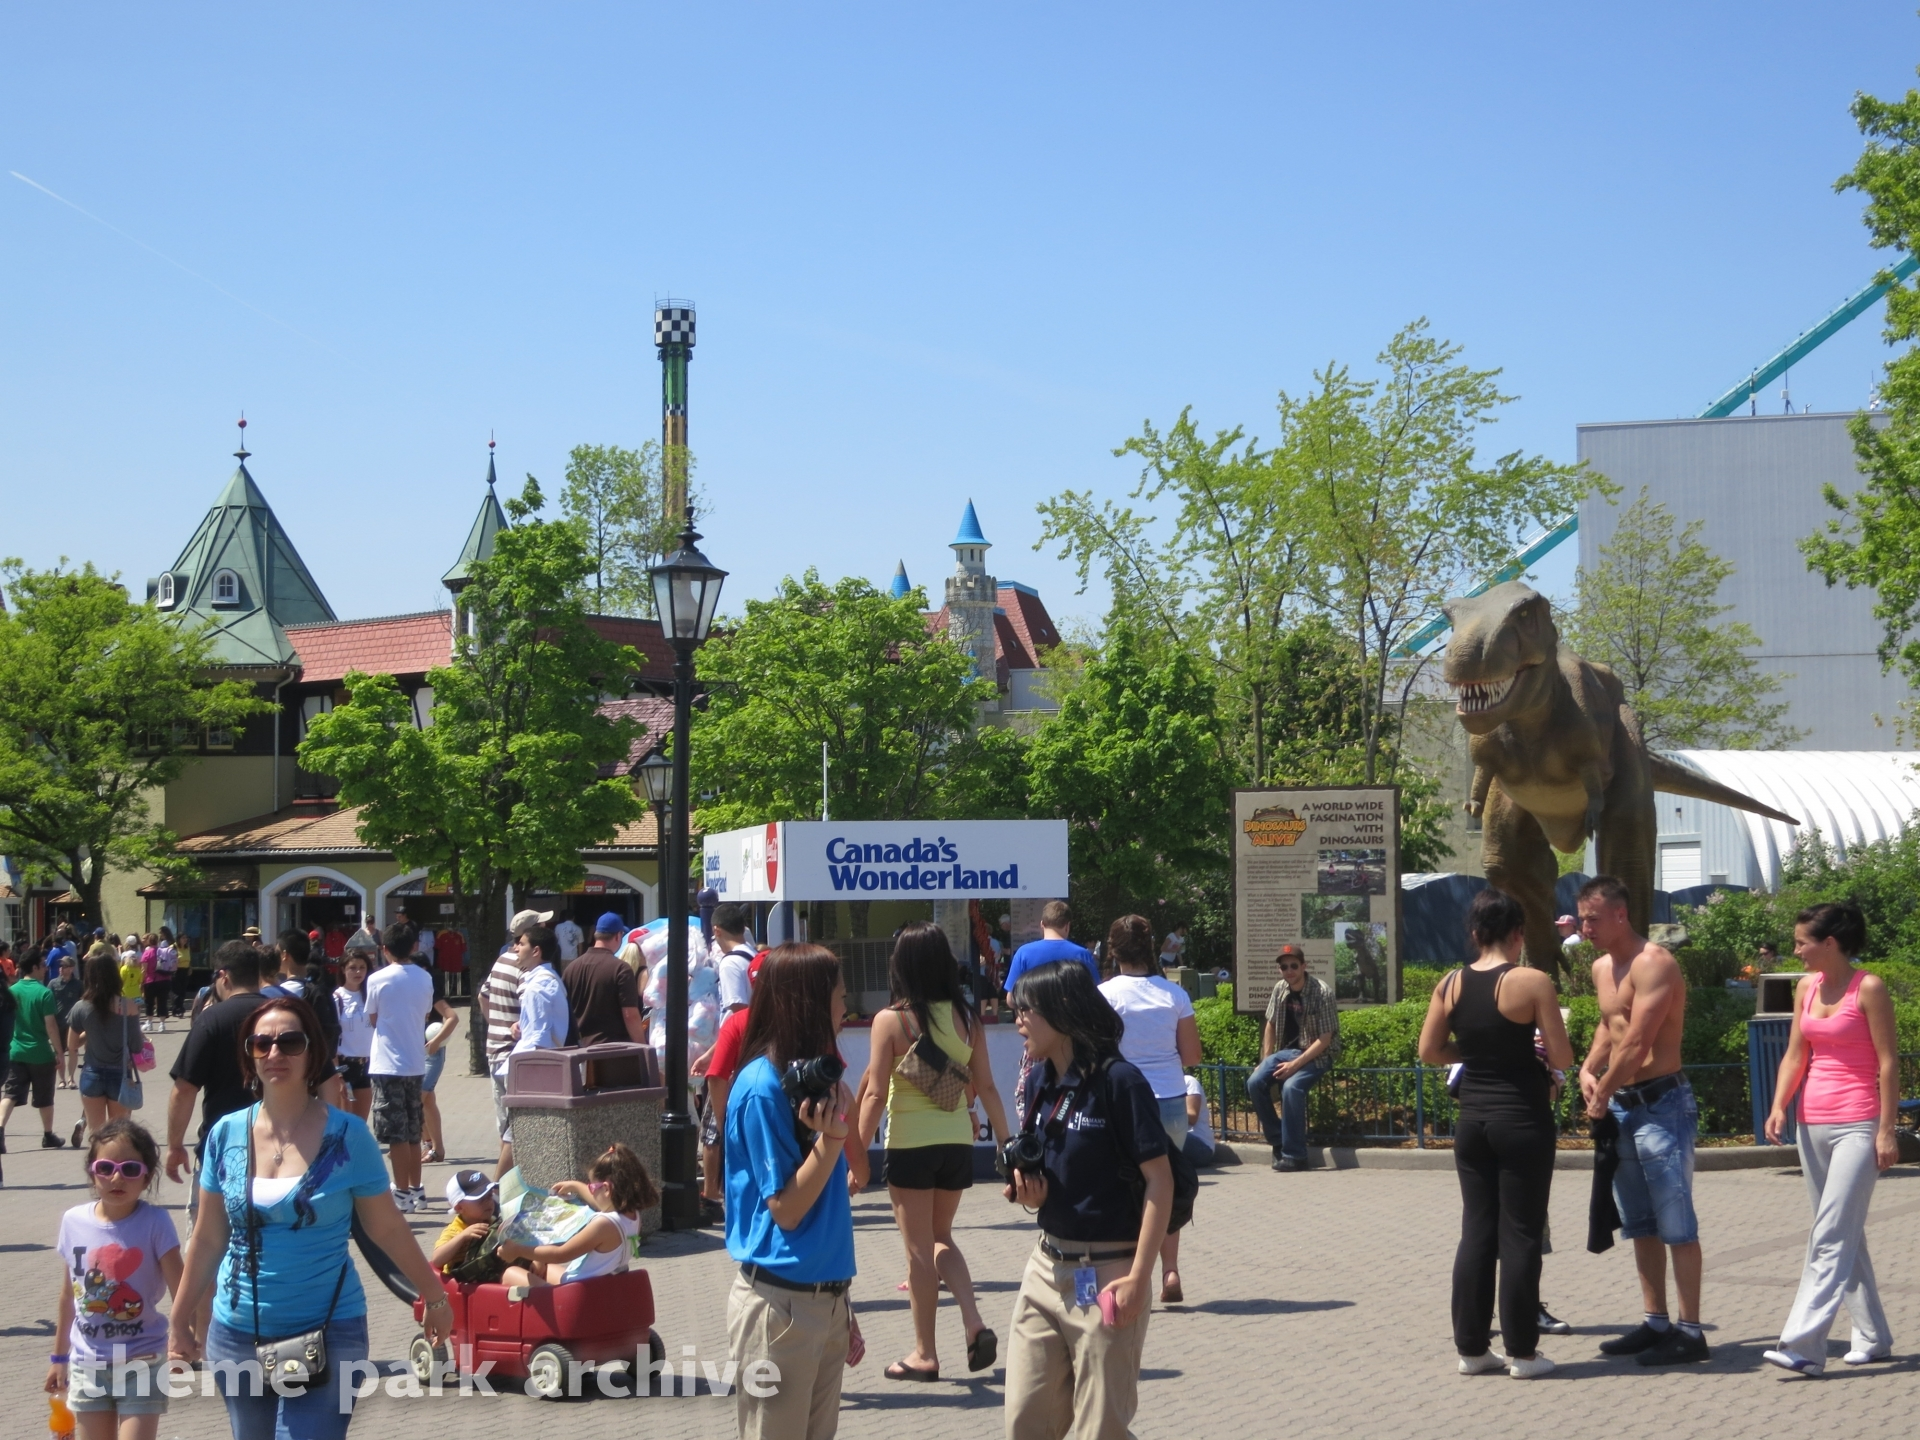 International Street at Canada's Wonderland